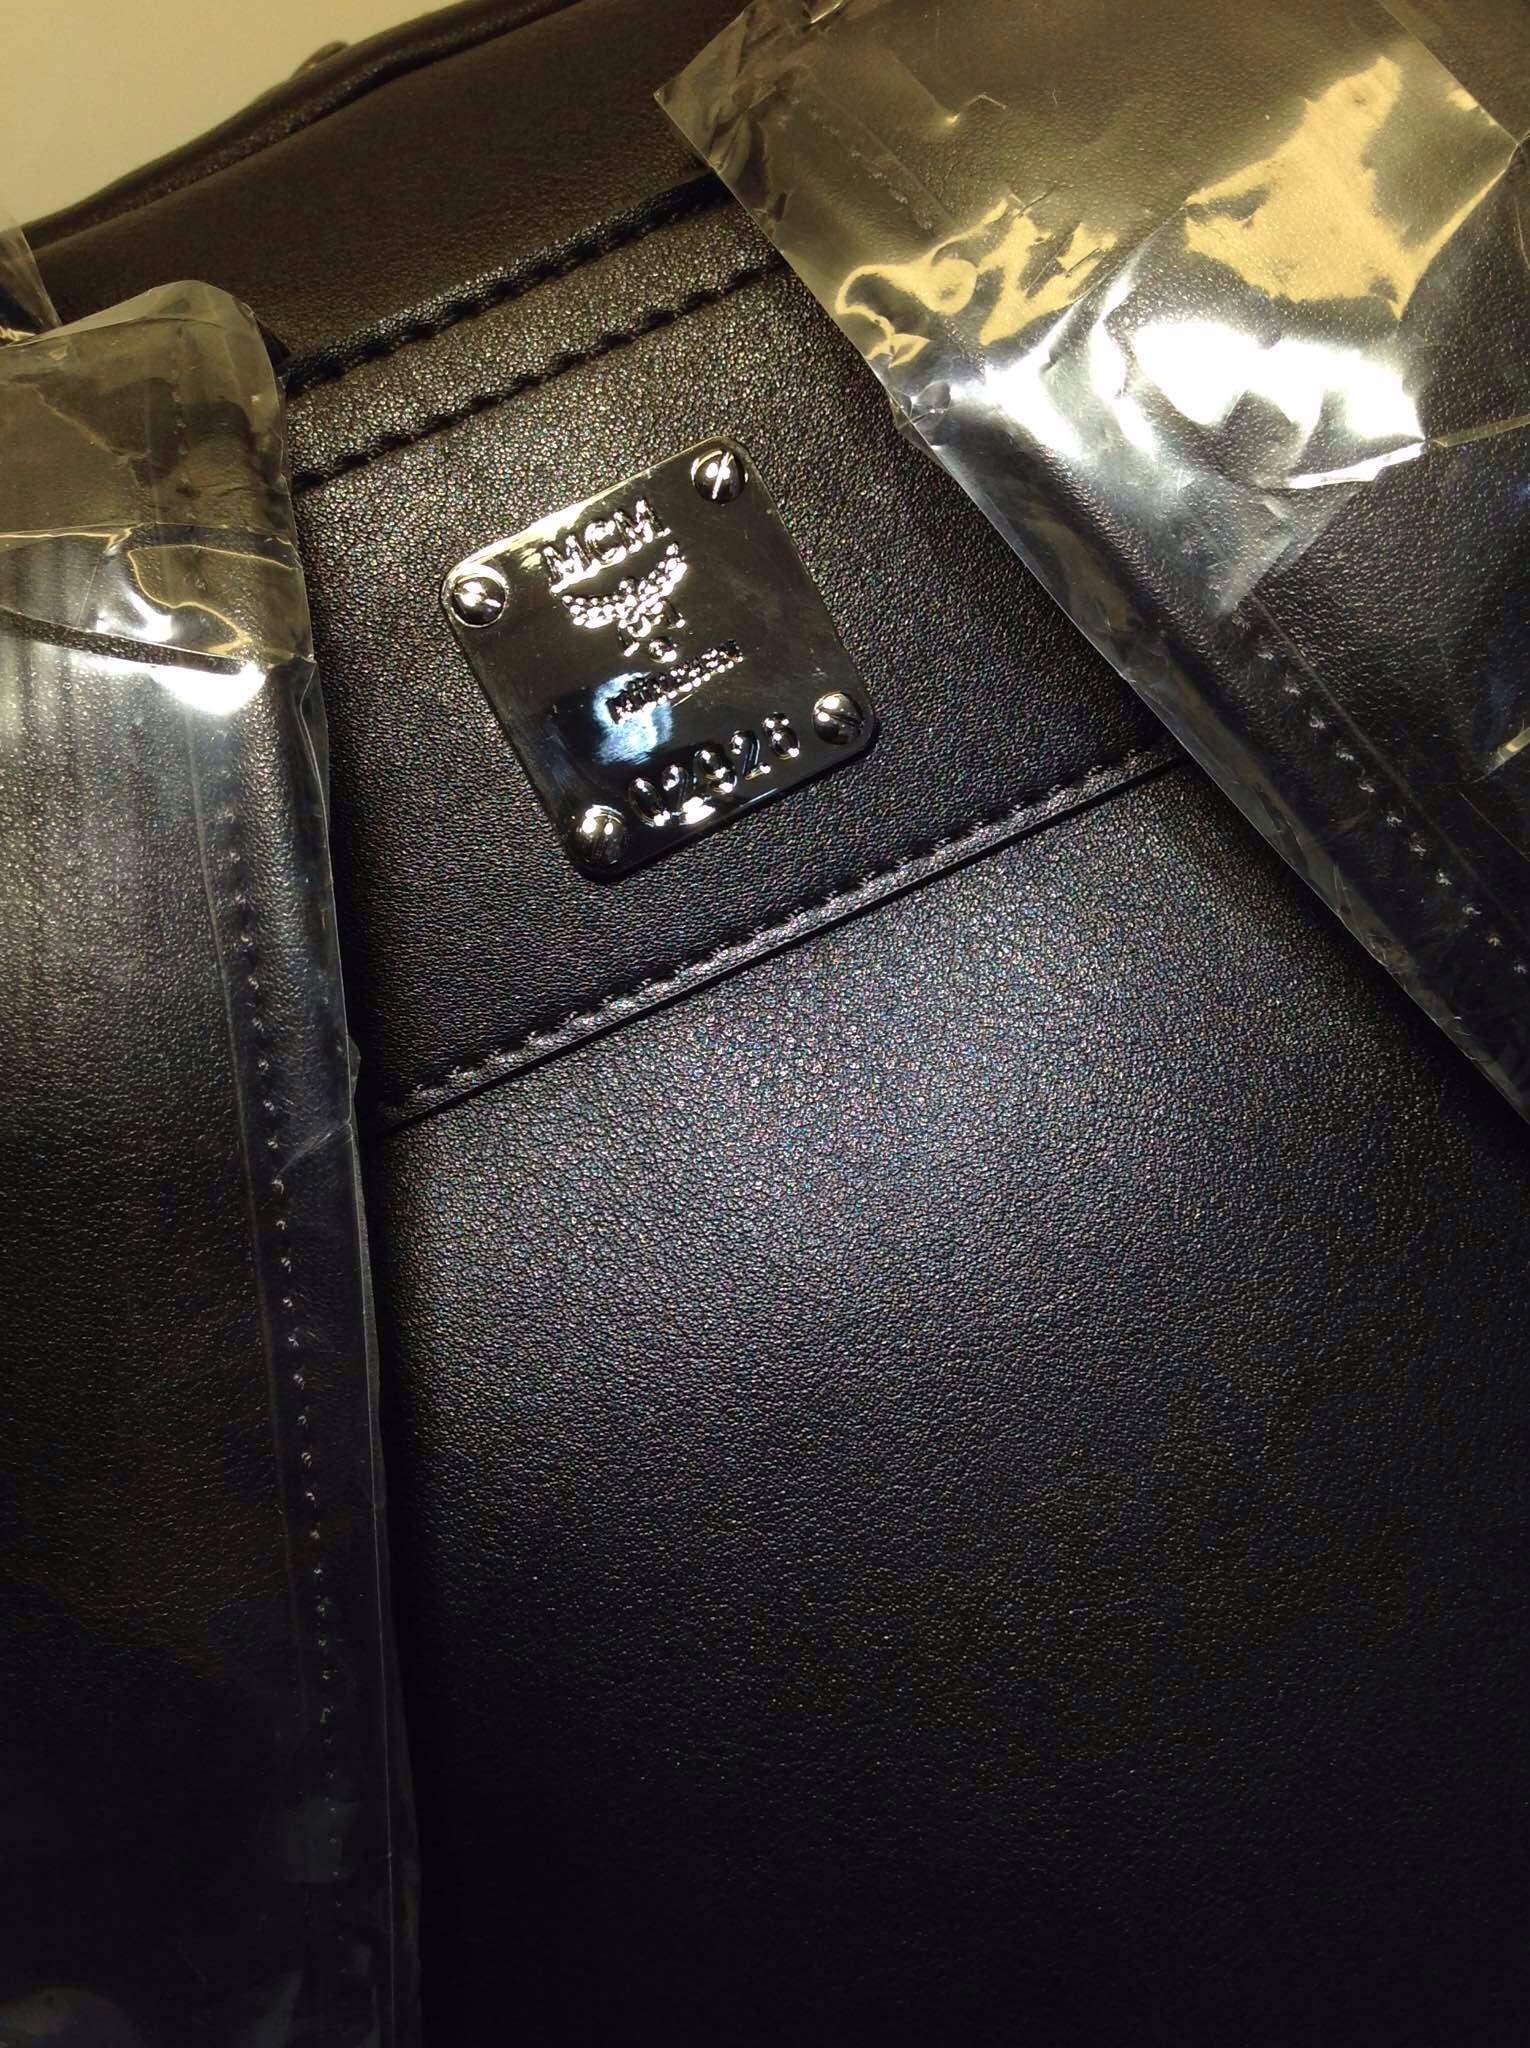 MCM专柜新款 牛皮压花 中号双肩包 一件代发